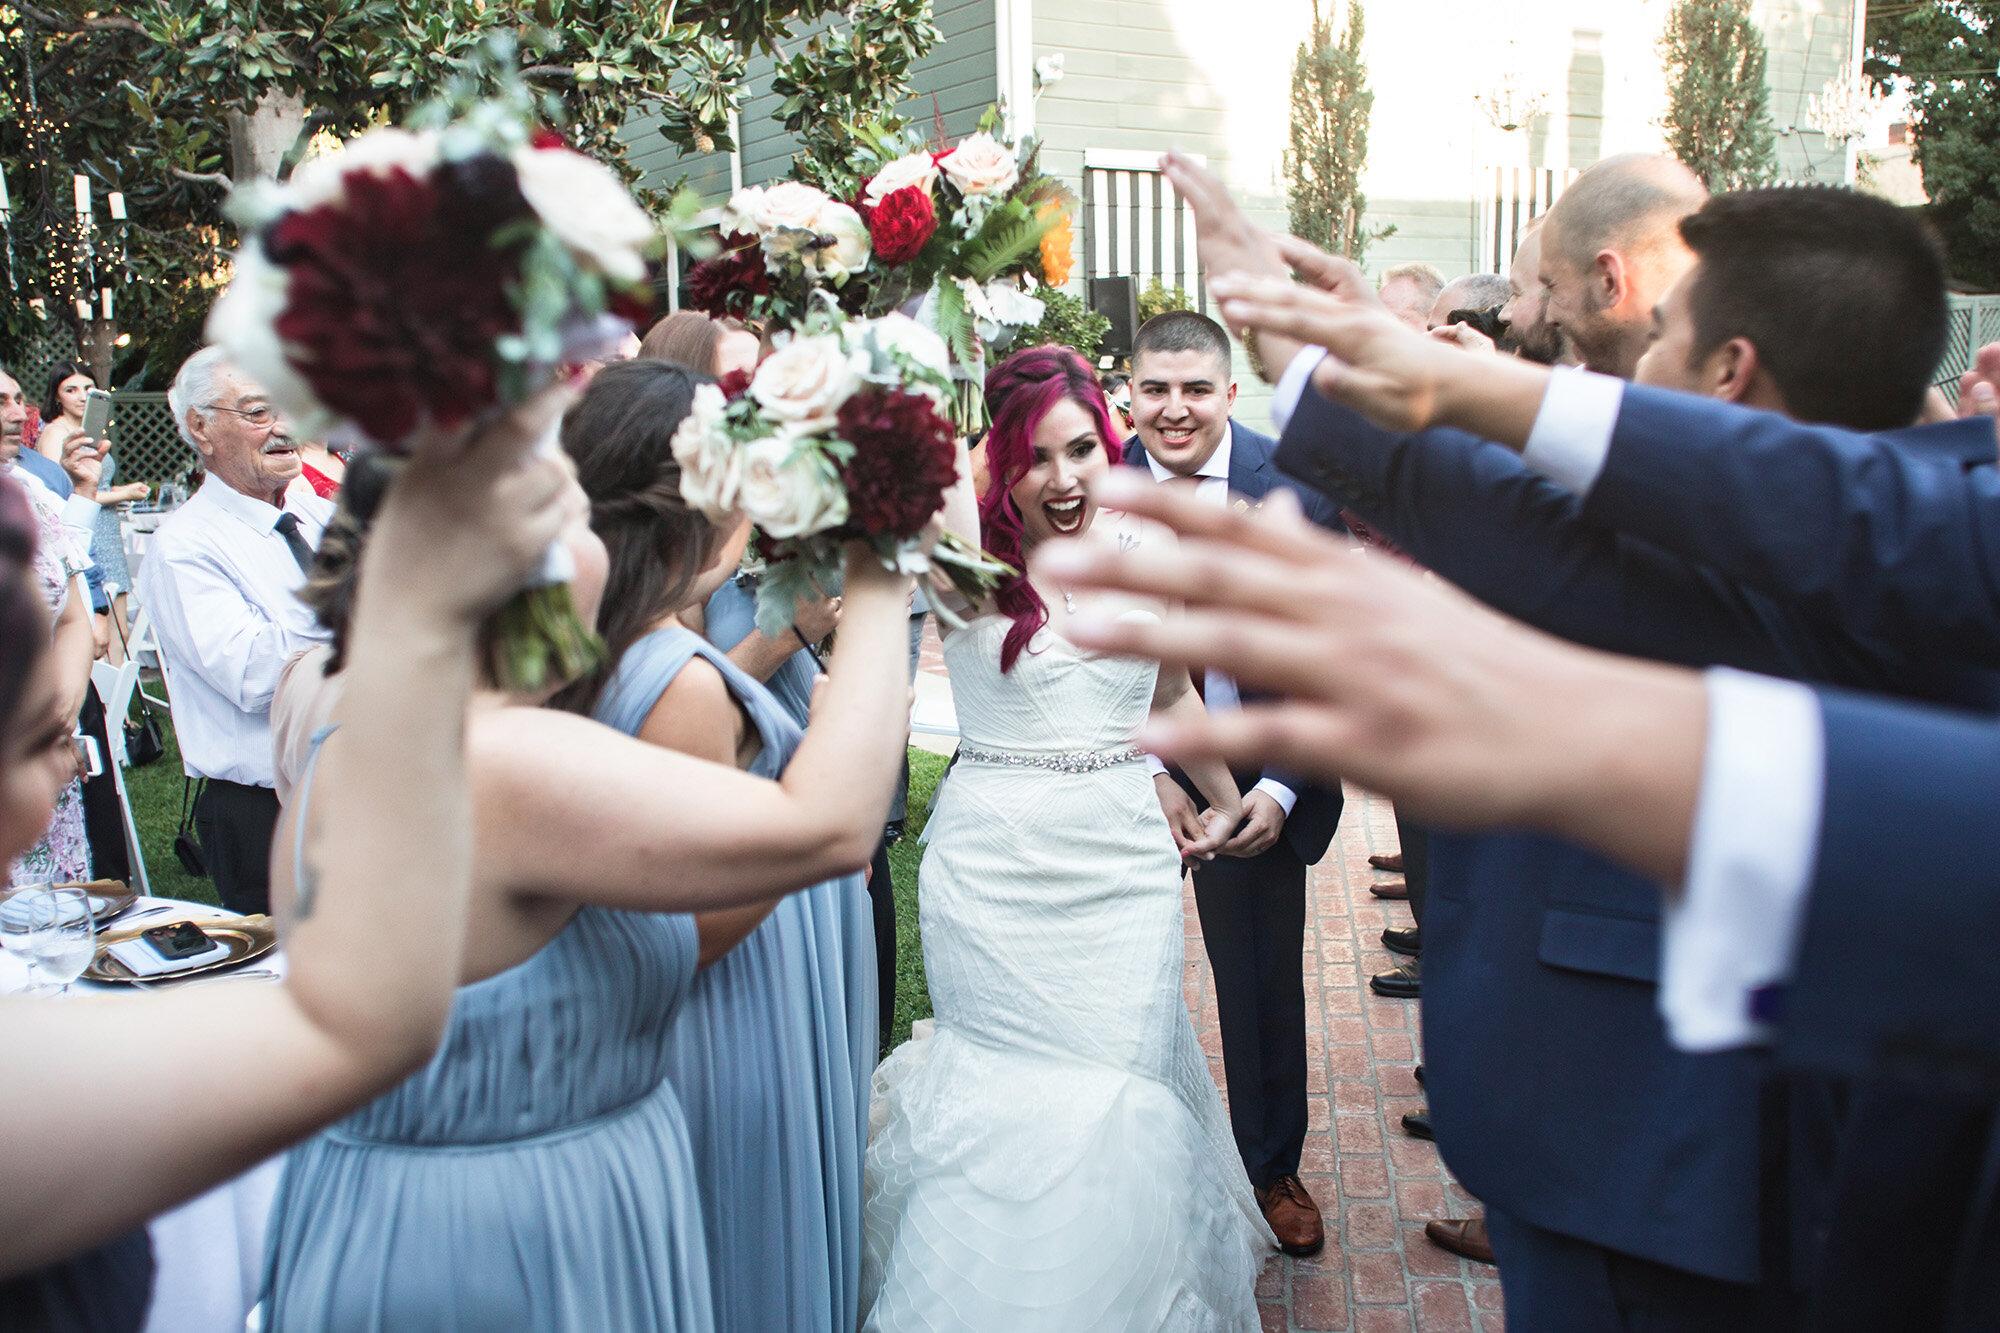 crazy-funchristmas-house-wedding-carrie-vines-010.jpg